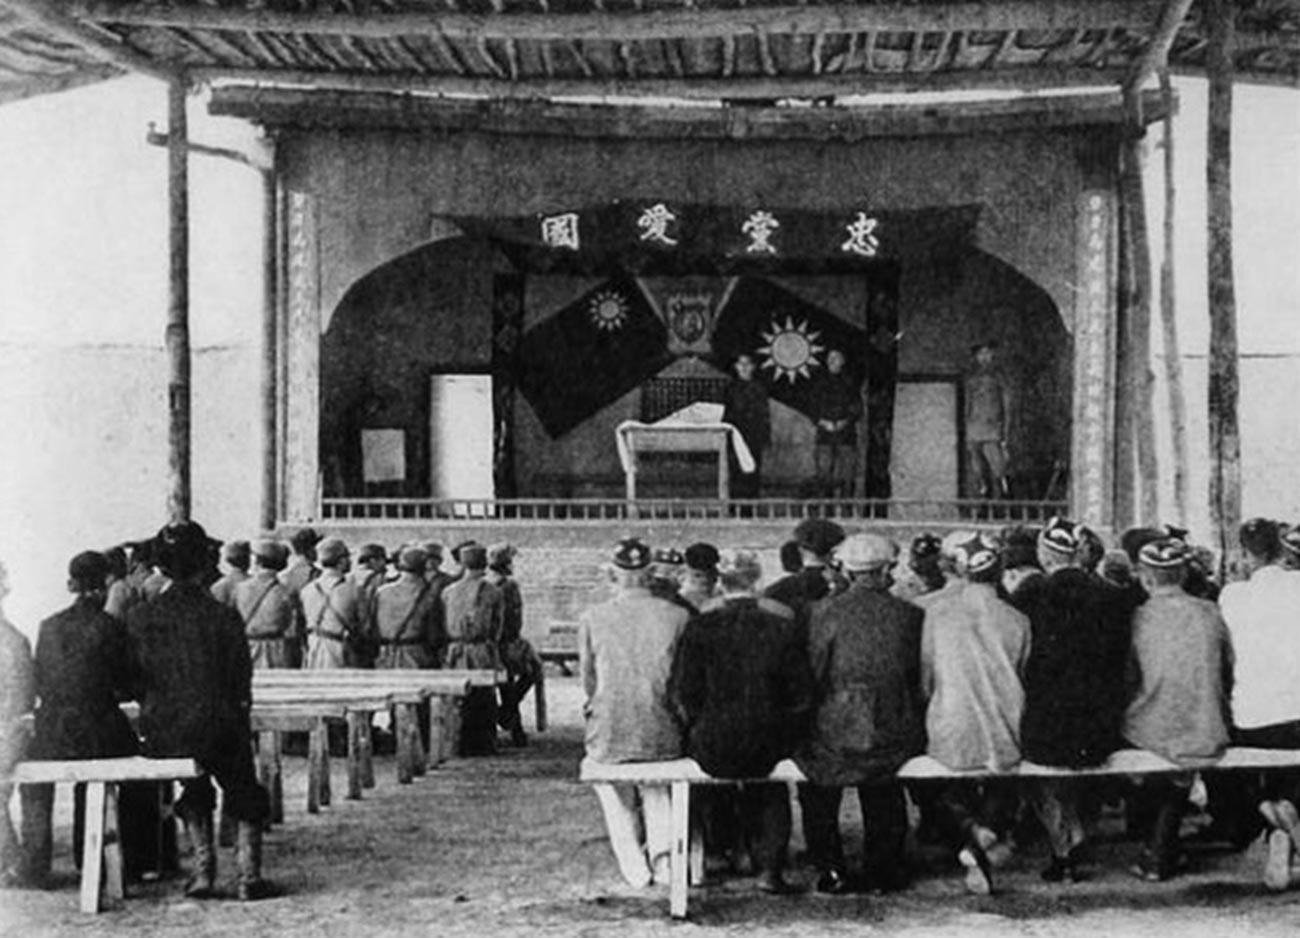 Un incontro del Kuomintang nello Xinjiang